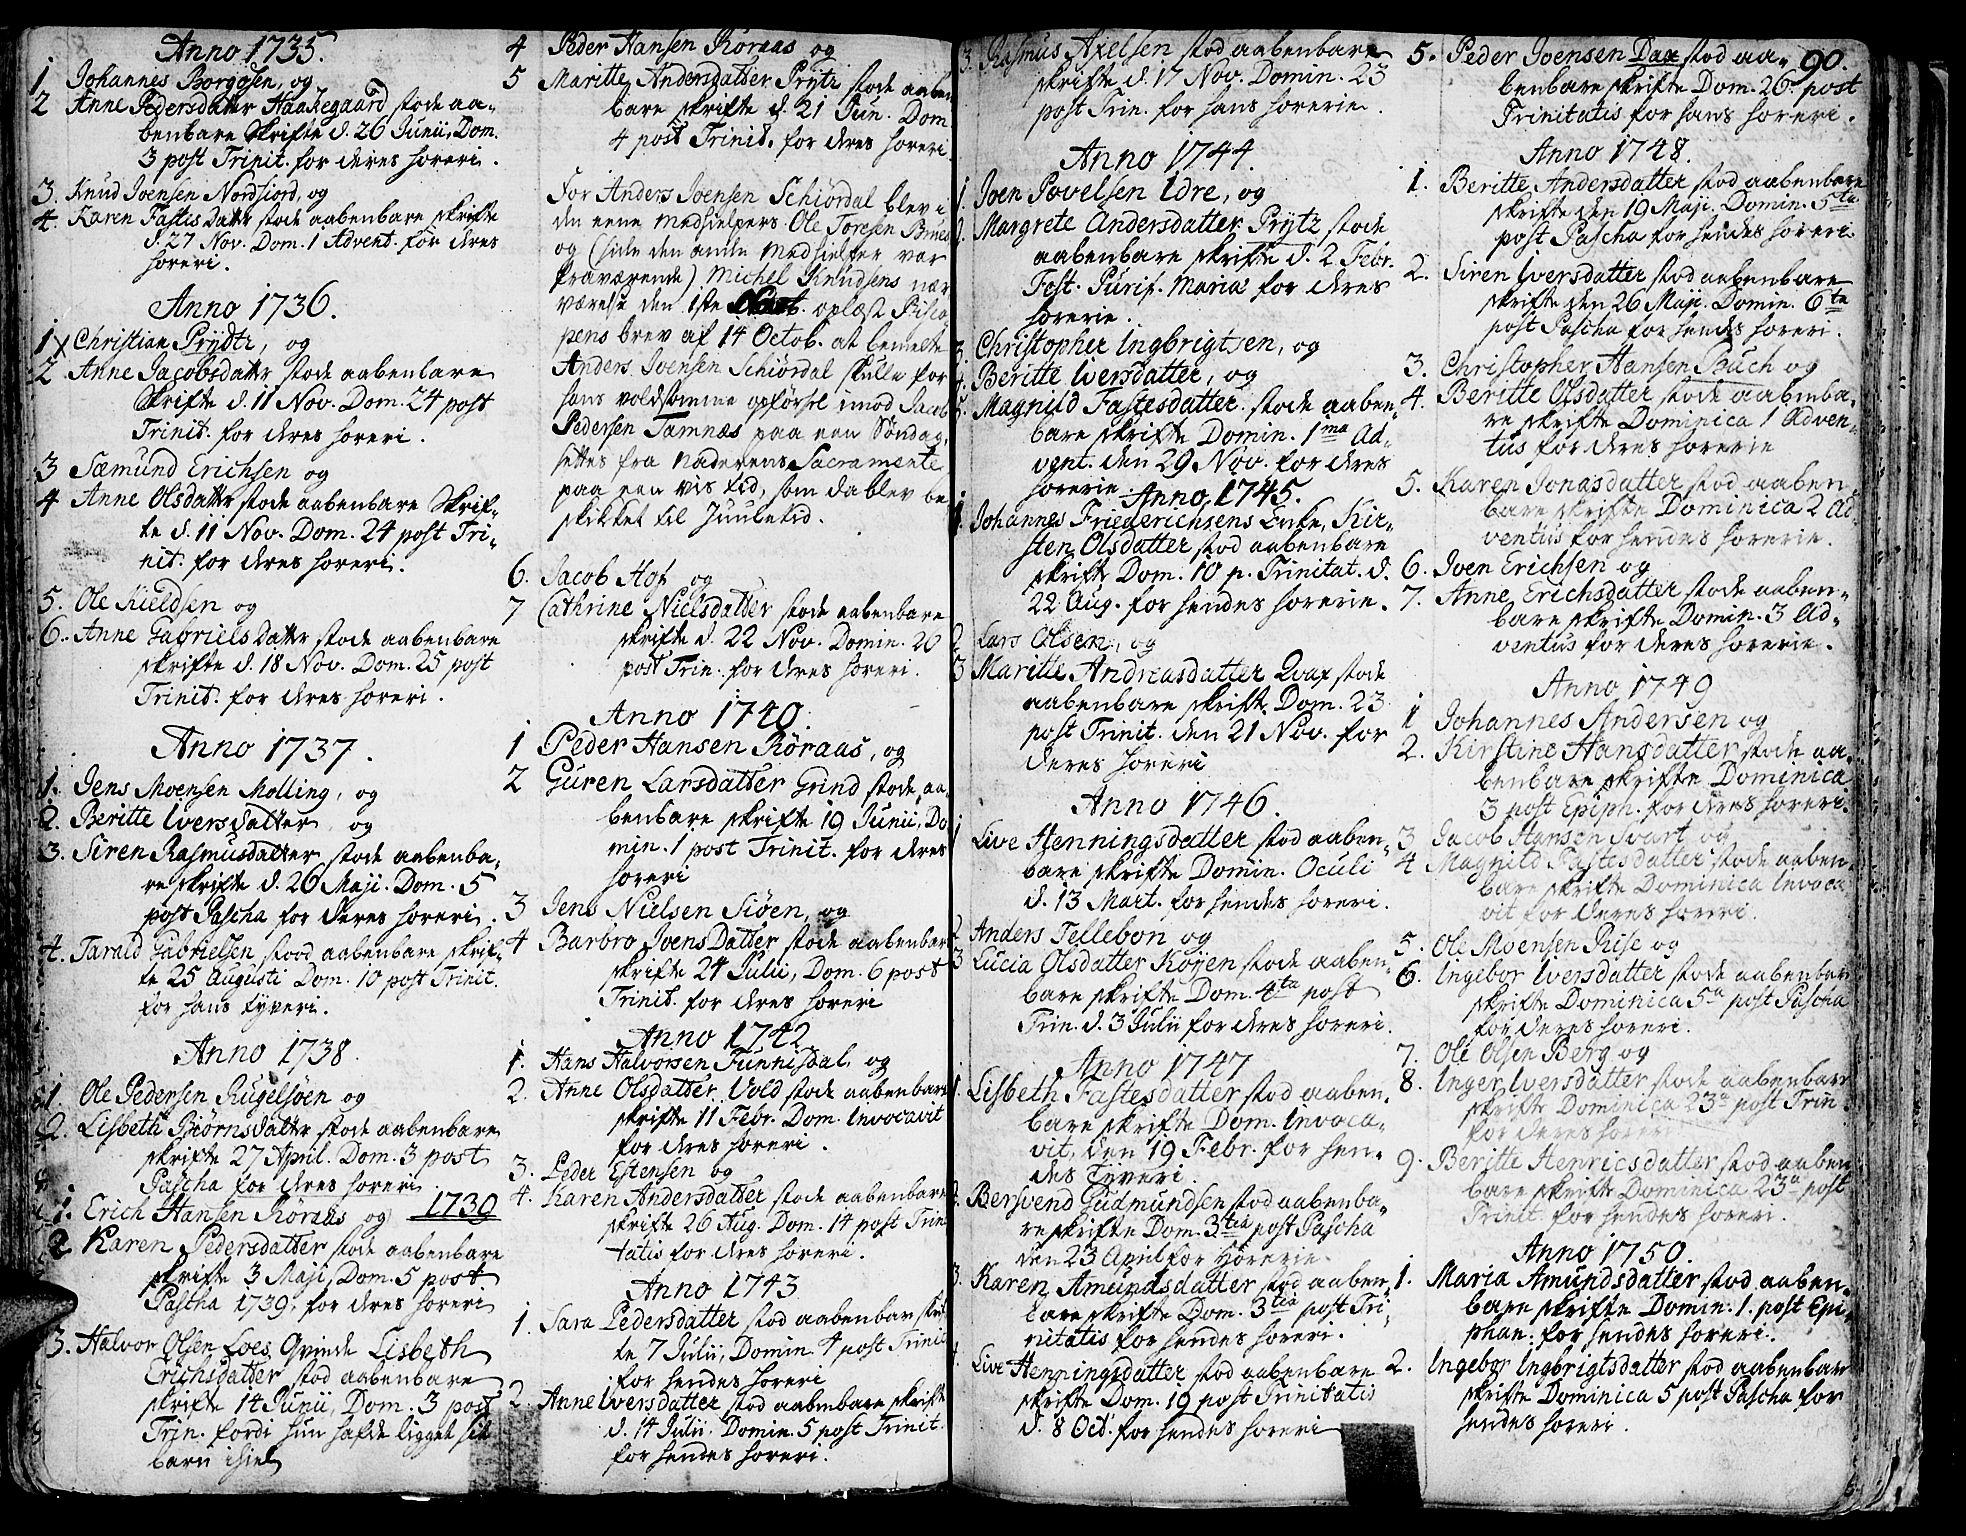 SAT, Ministerialprotokoller, klokkerbøker og fødselsregistre - Sør-Trøndelag, 681/L0925: Parish register (official) no. 681A03, 1727-1766, p. 90